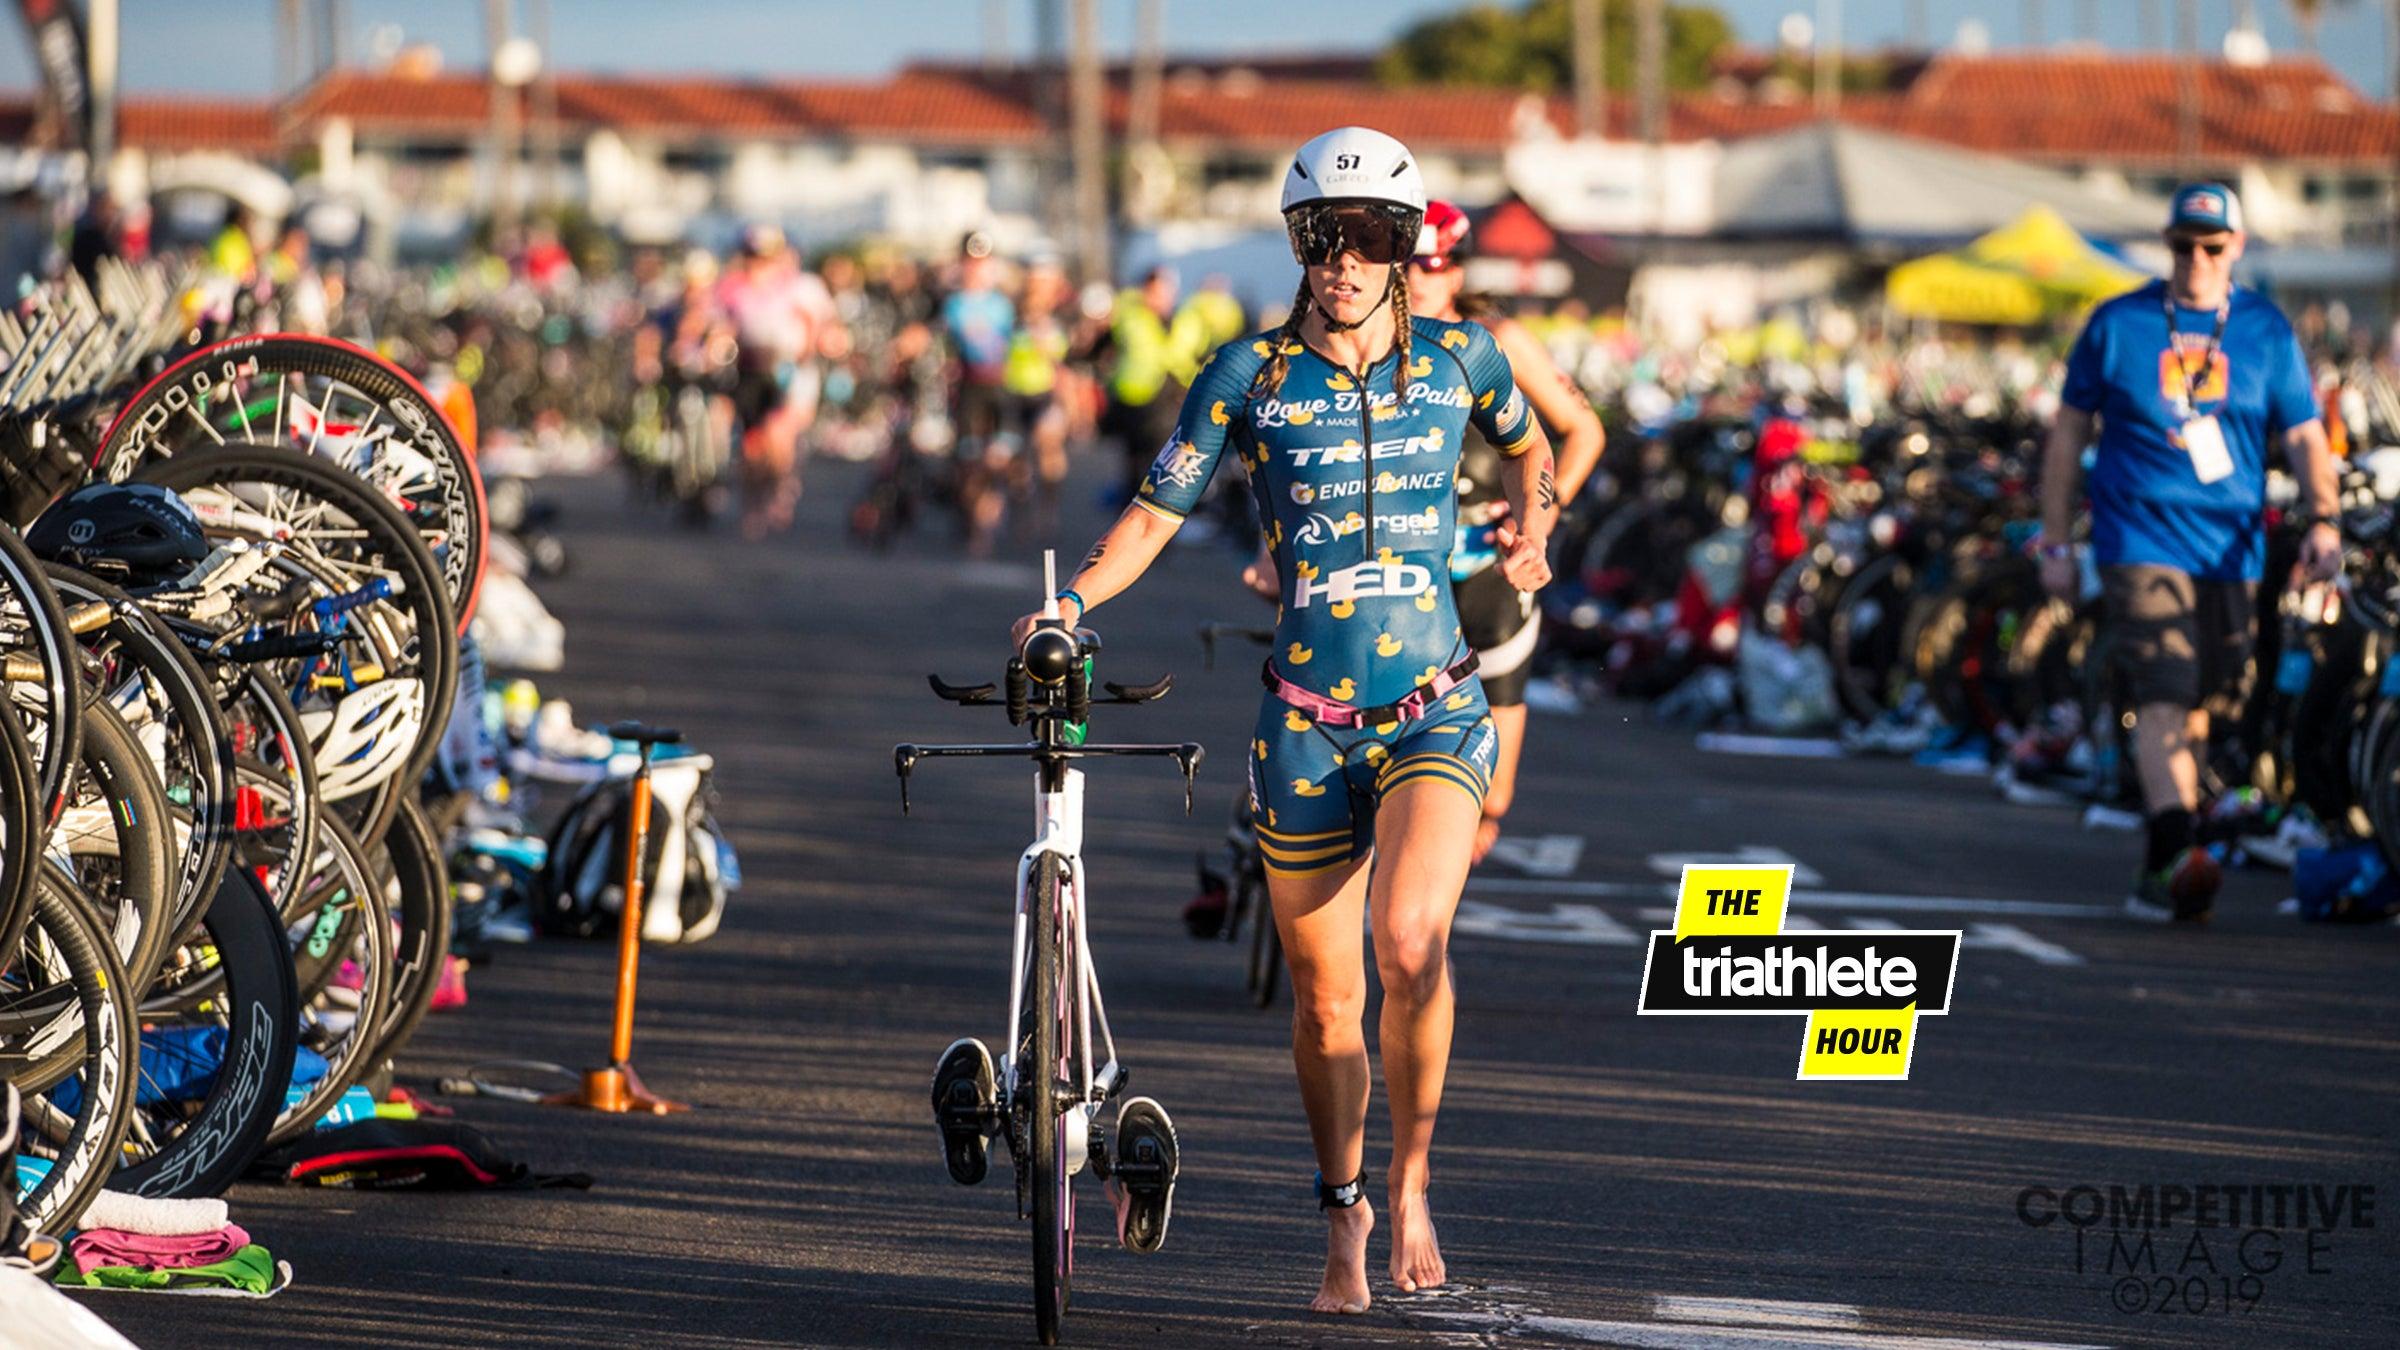 The Triathlete Hour Podcast: Ellie Salthouse Enjoys The Journey – Triathlete